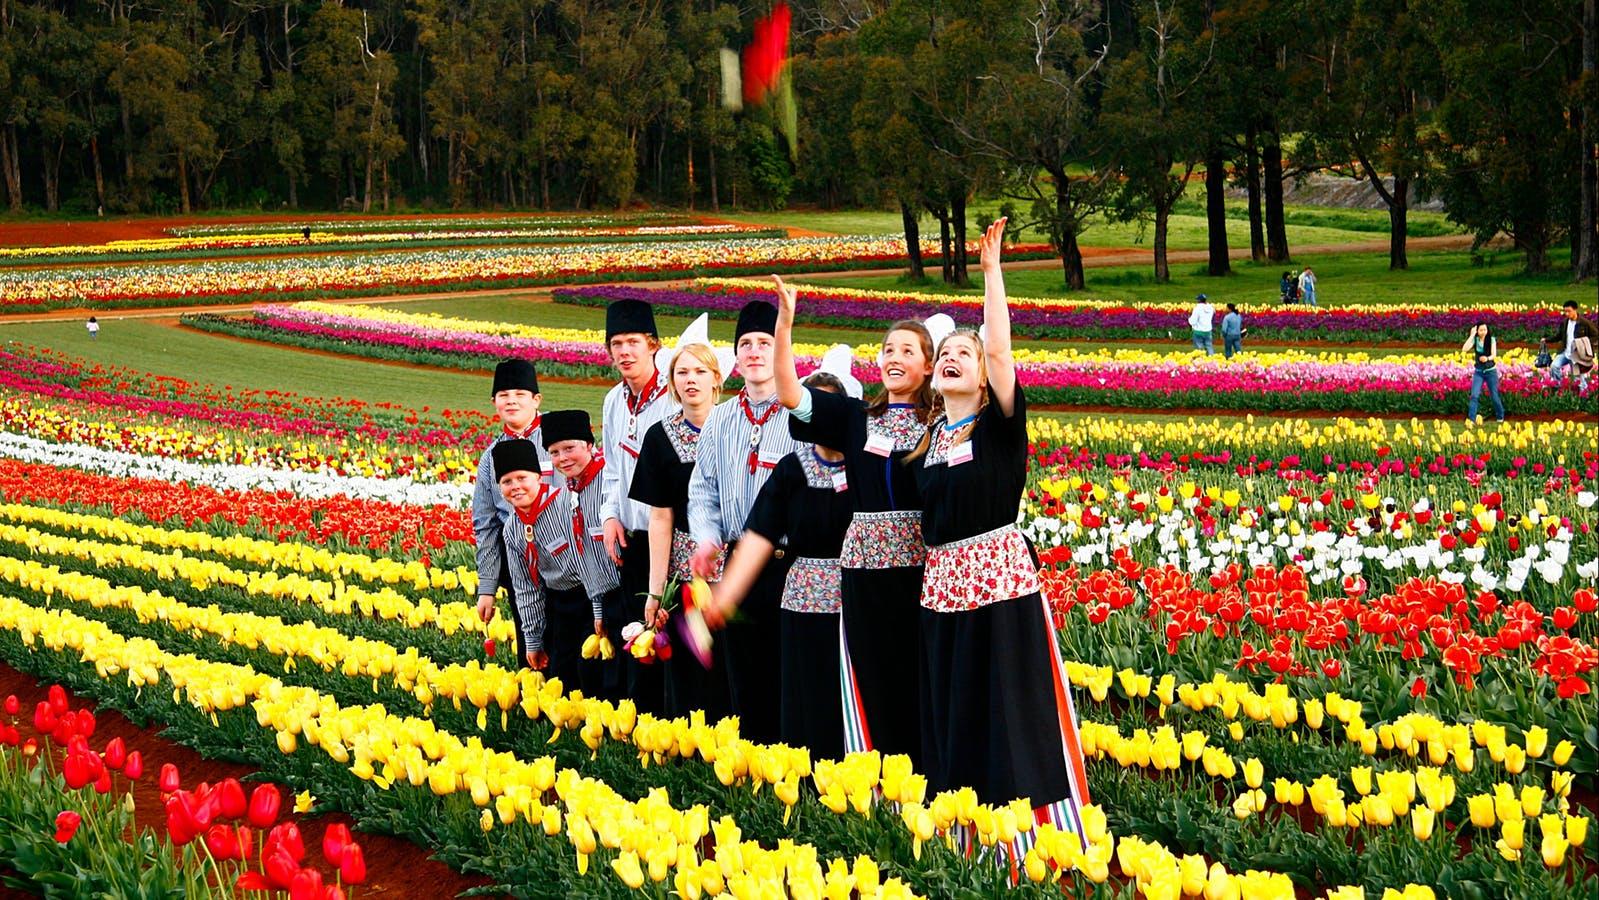 Staff dress in traditional Dutch costume.